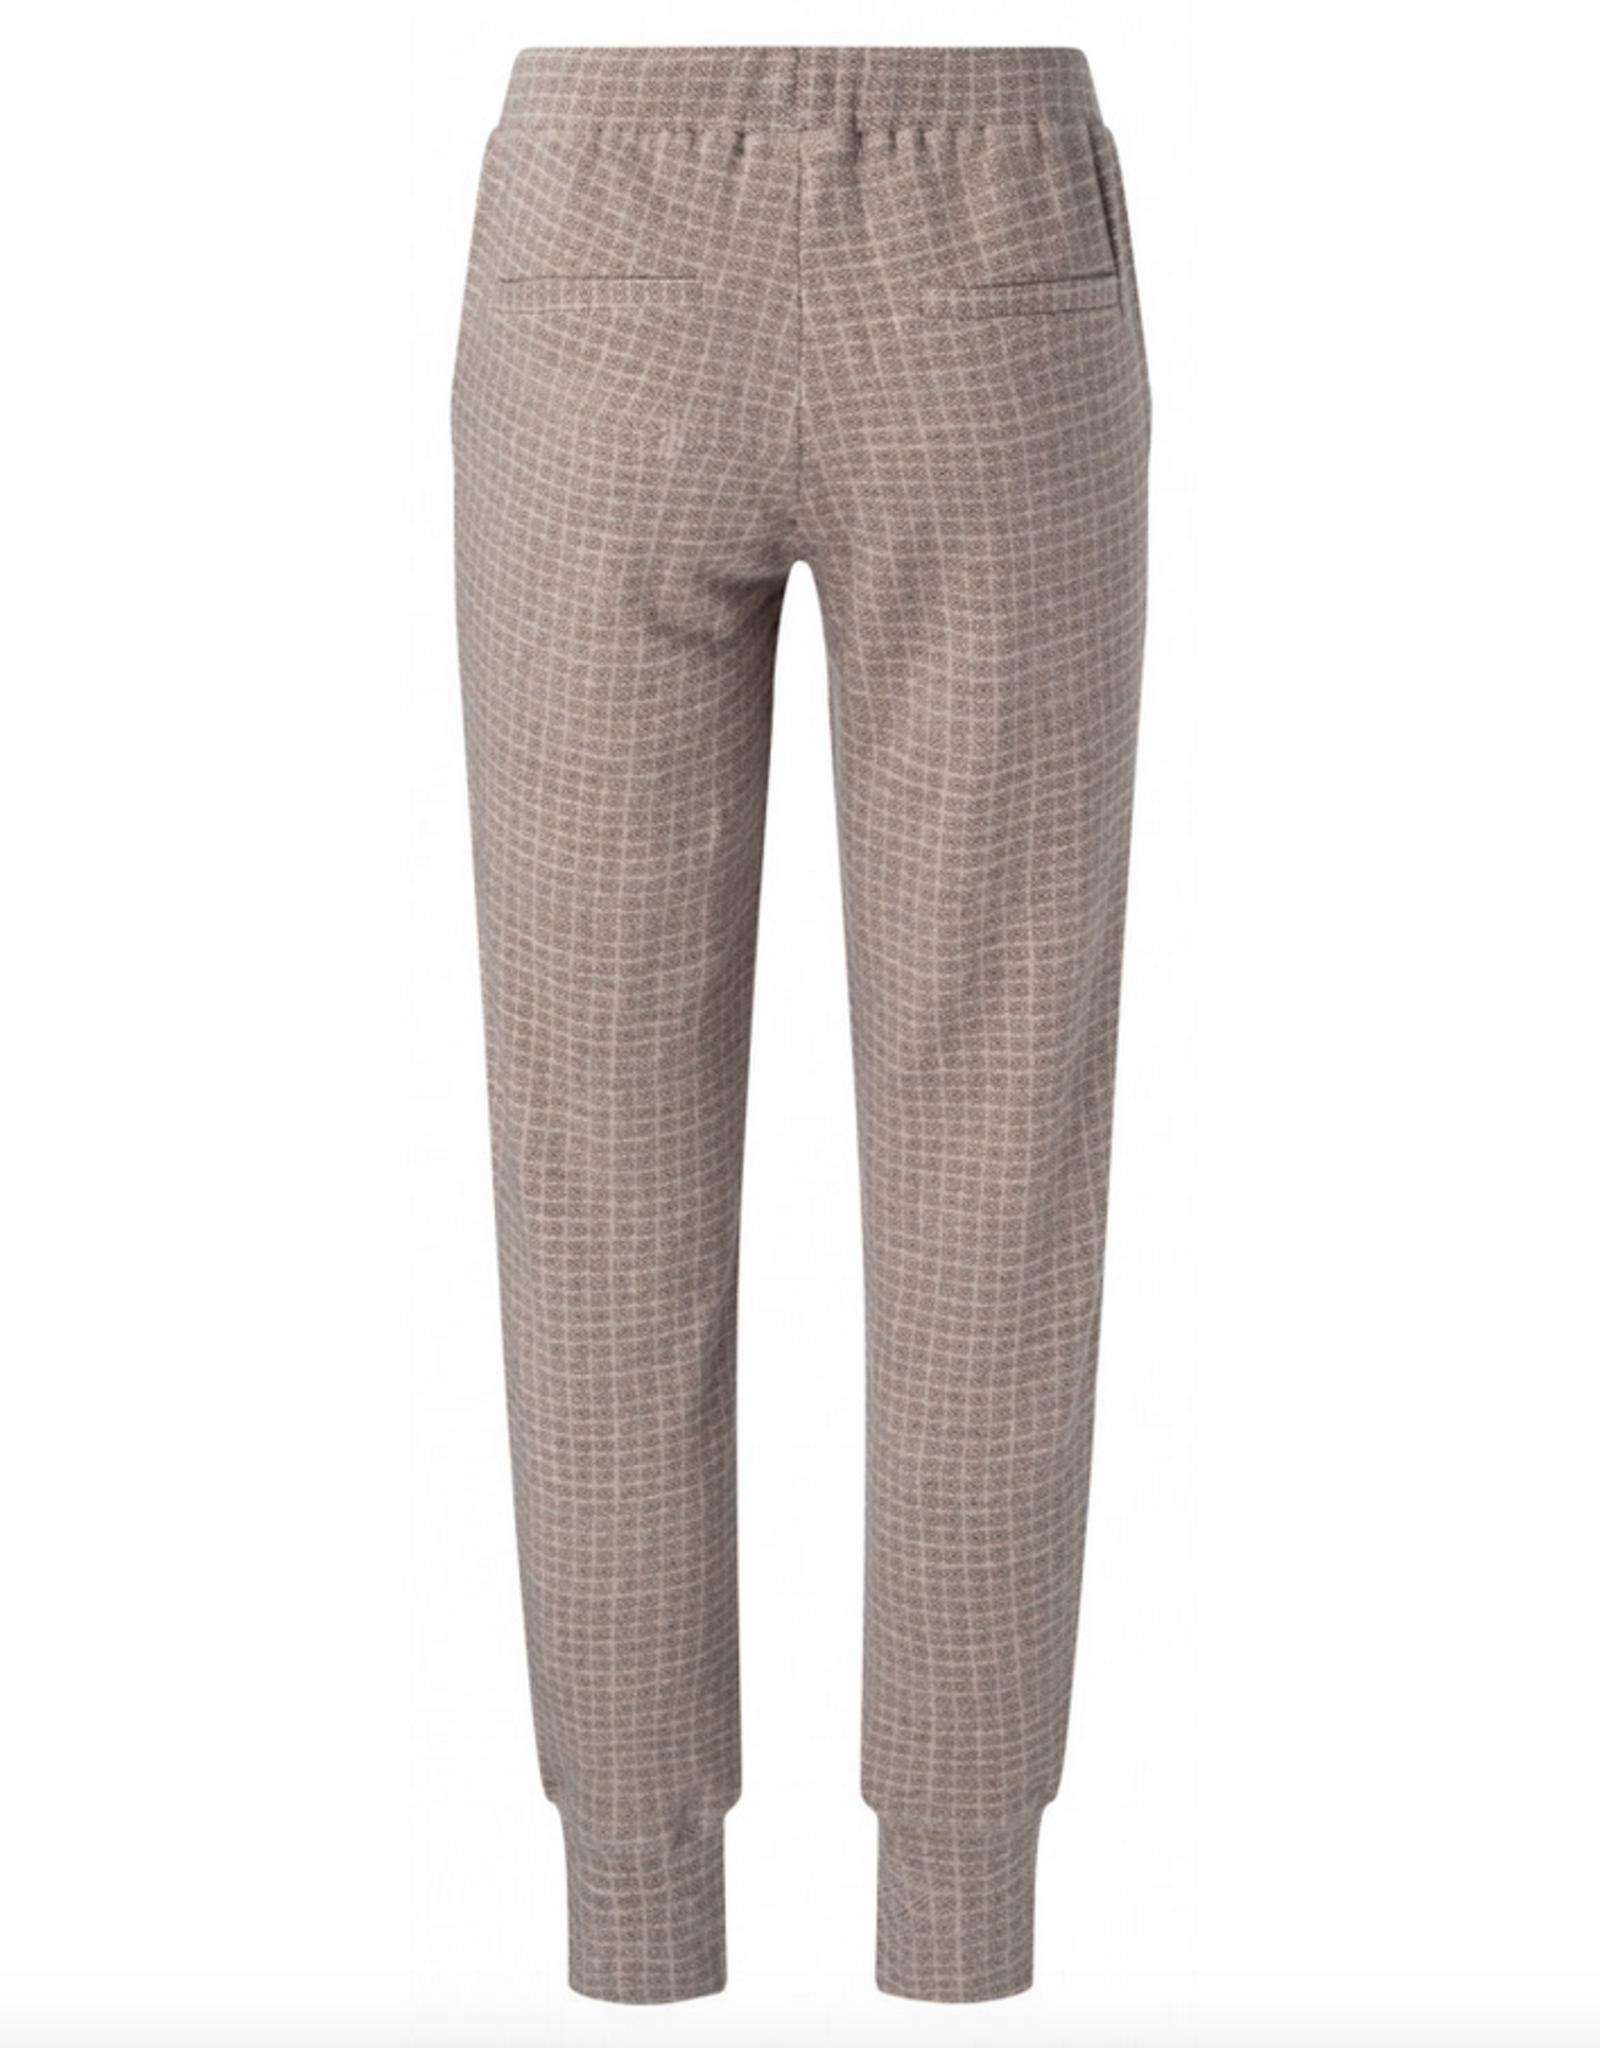 YAYA Cotton Jogger Pants